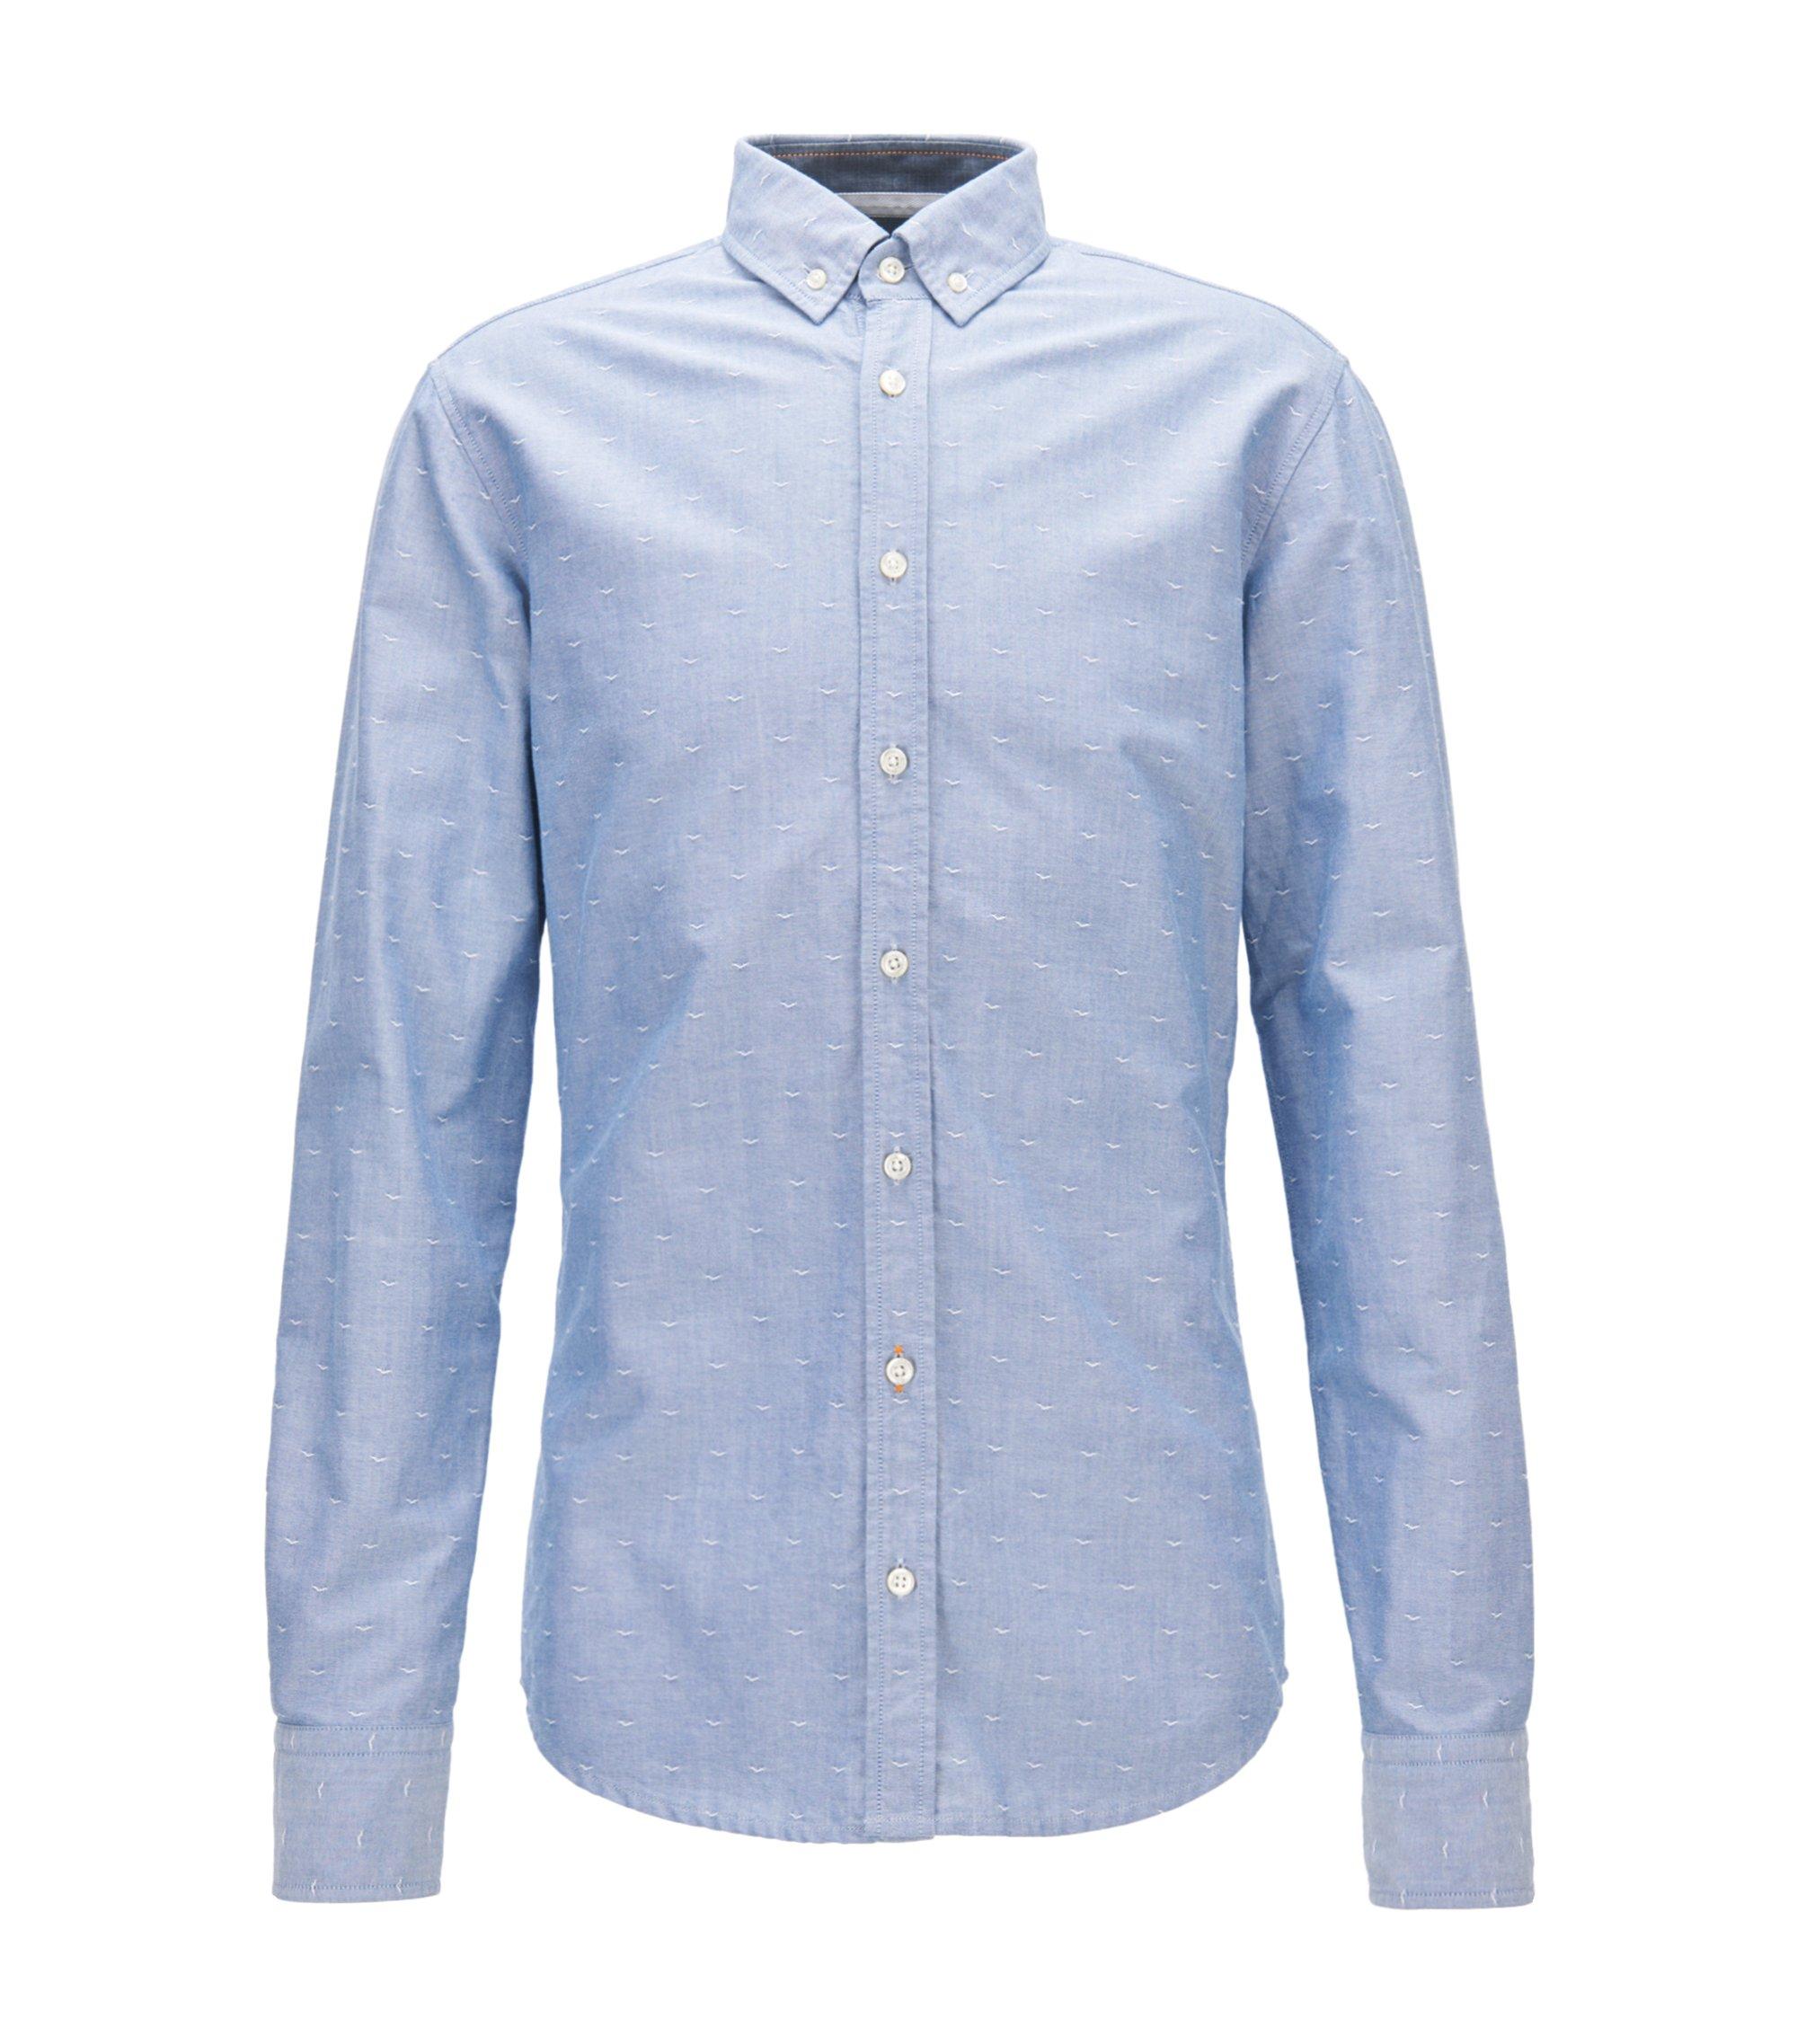 Slim-fit overhemd van dobby-Oxfordkatoen, Lichtblauw